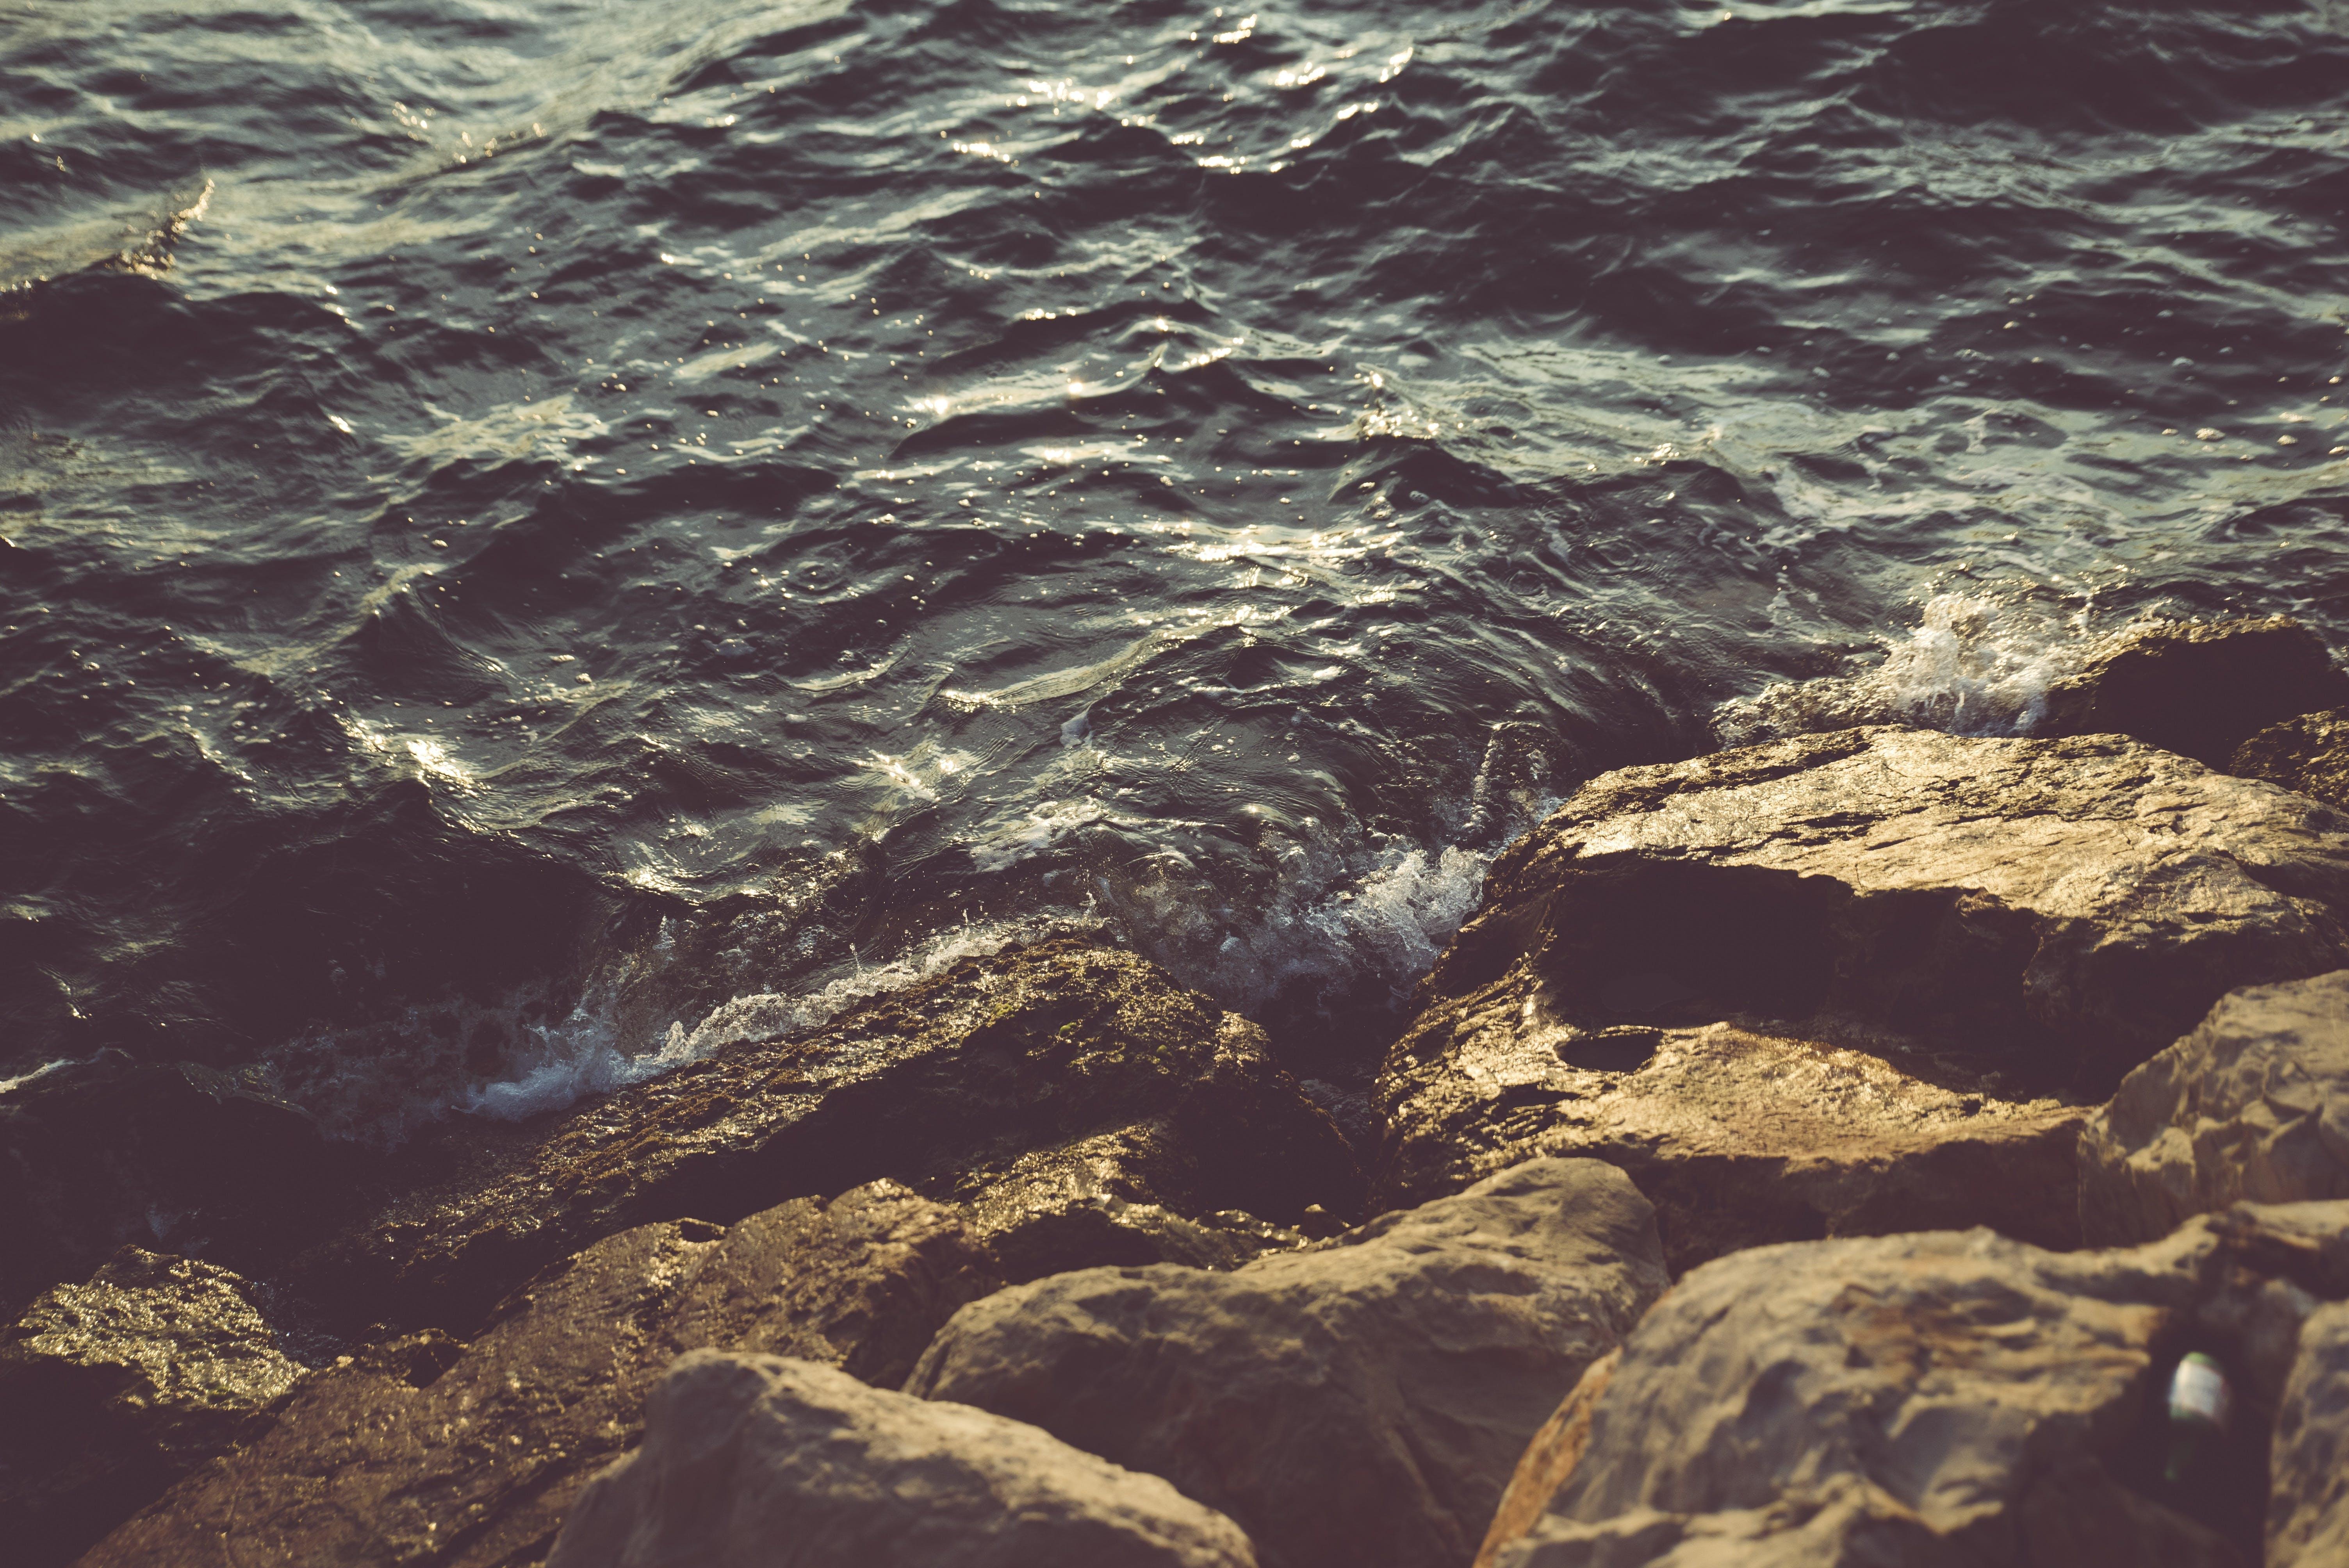 Ocean Wave Toward Brown Rocks during Daytime